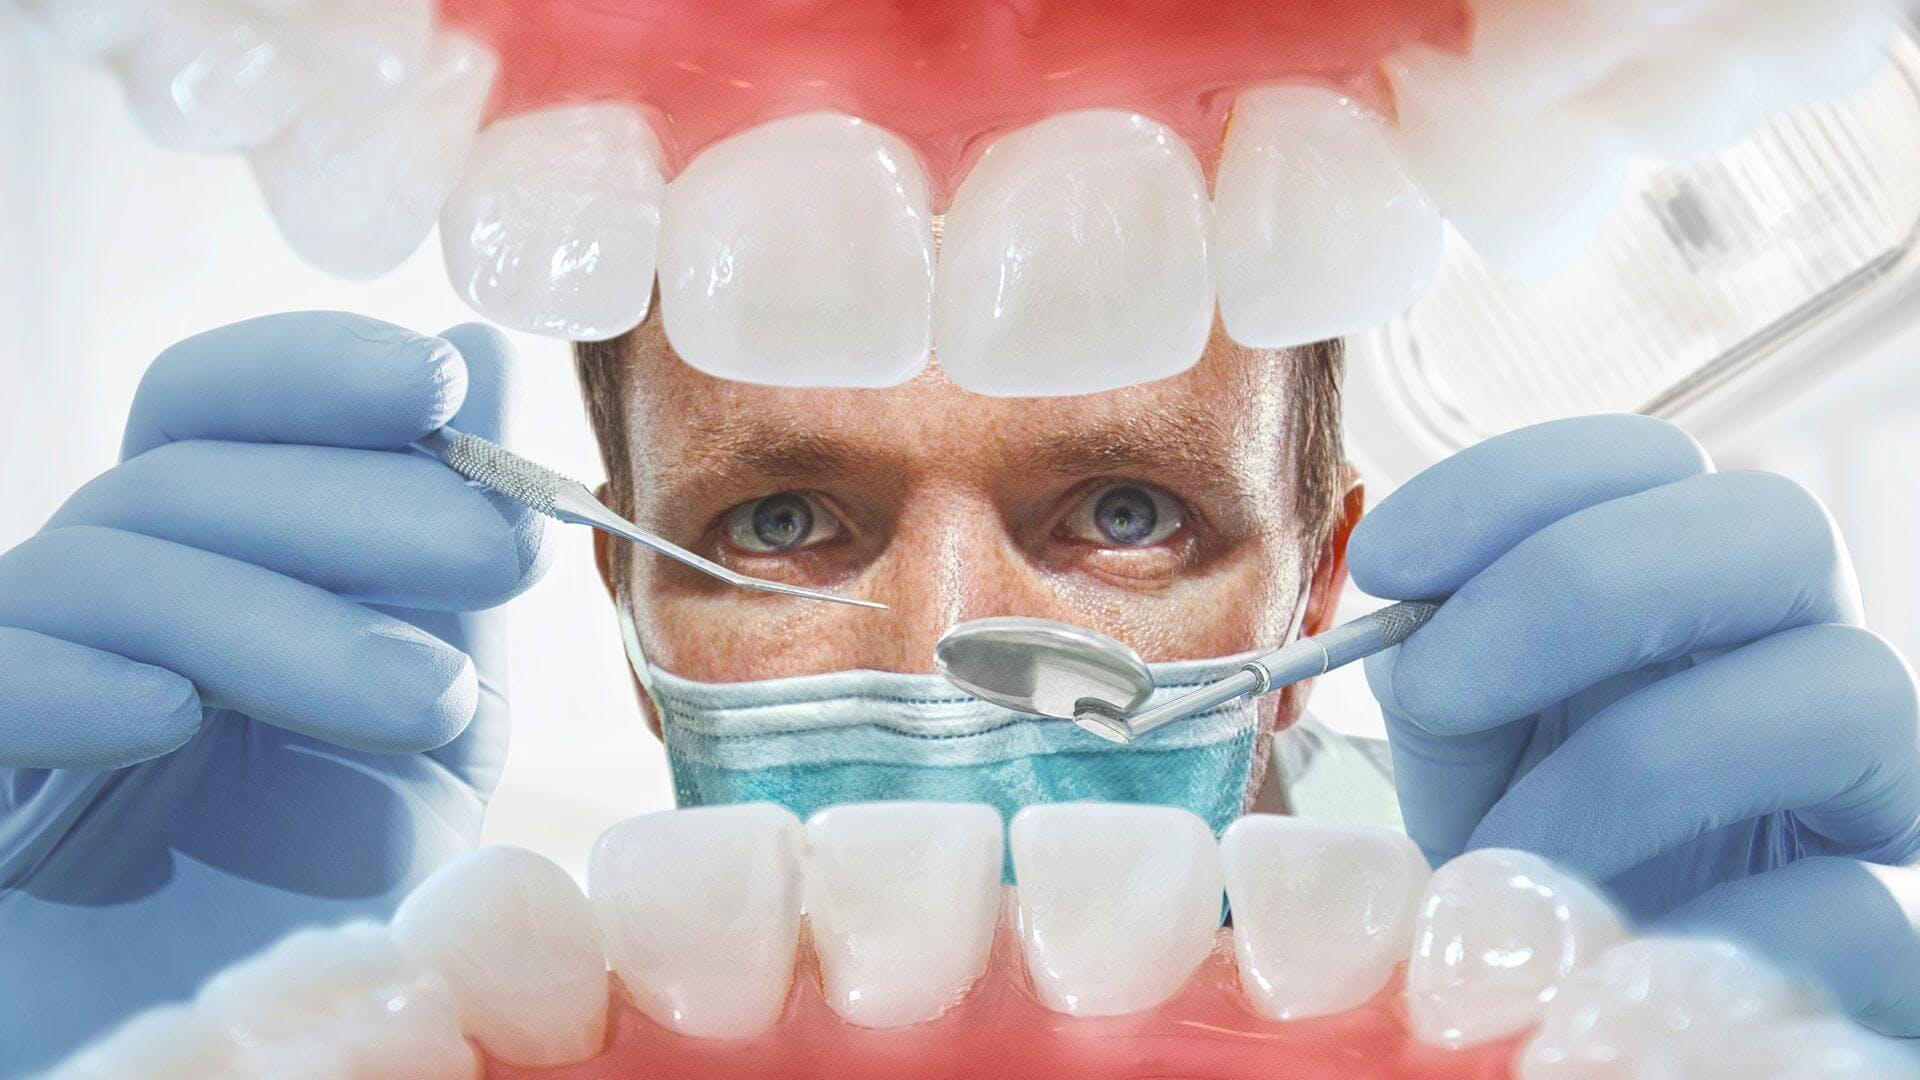 dentist-treating-patient